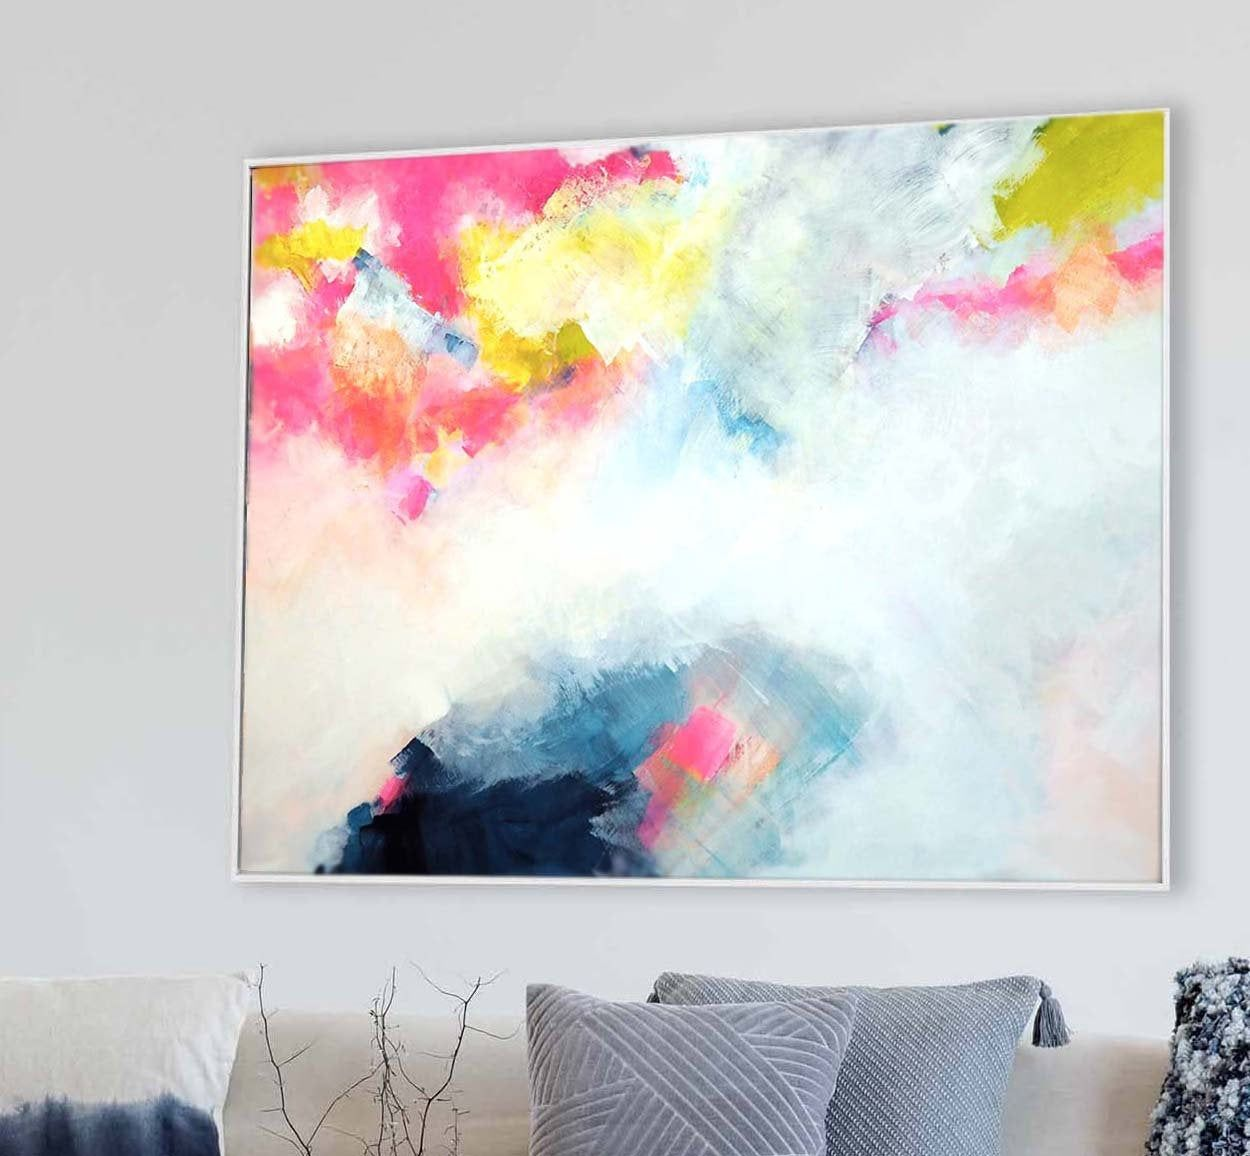 Blush Indigo Landscape Abstract Print Embellished Canvas Etsy Abstract Abstract Wall Art Abstract Print